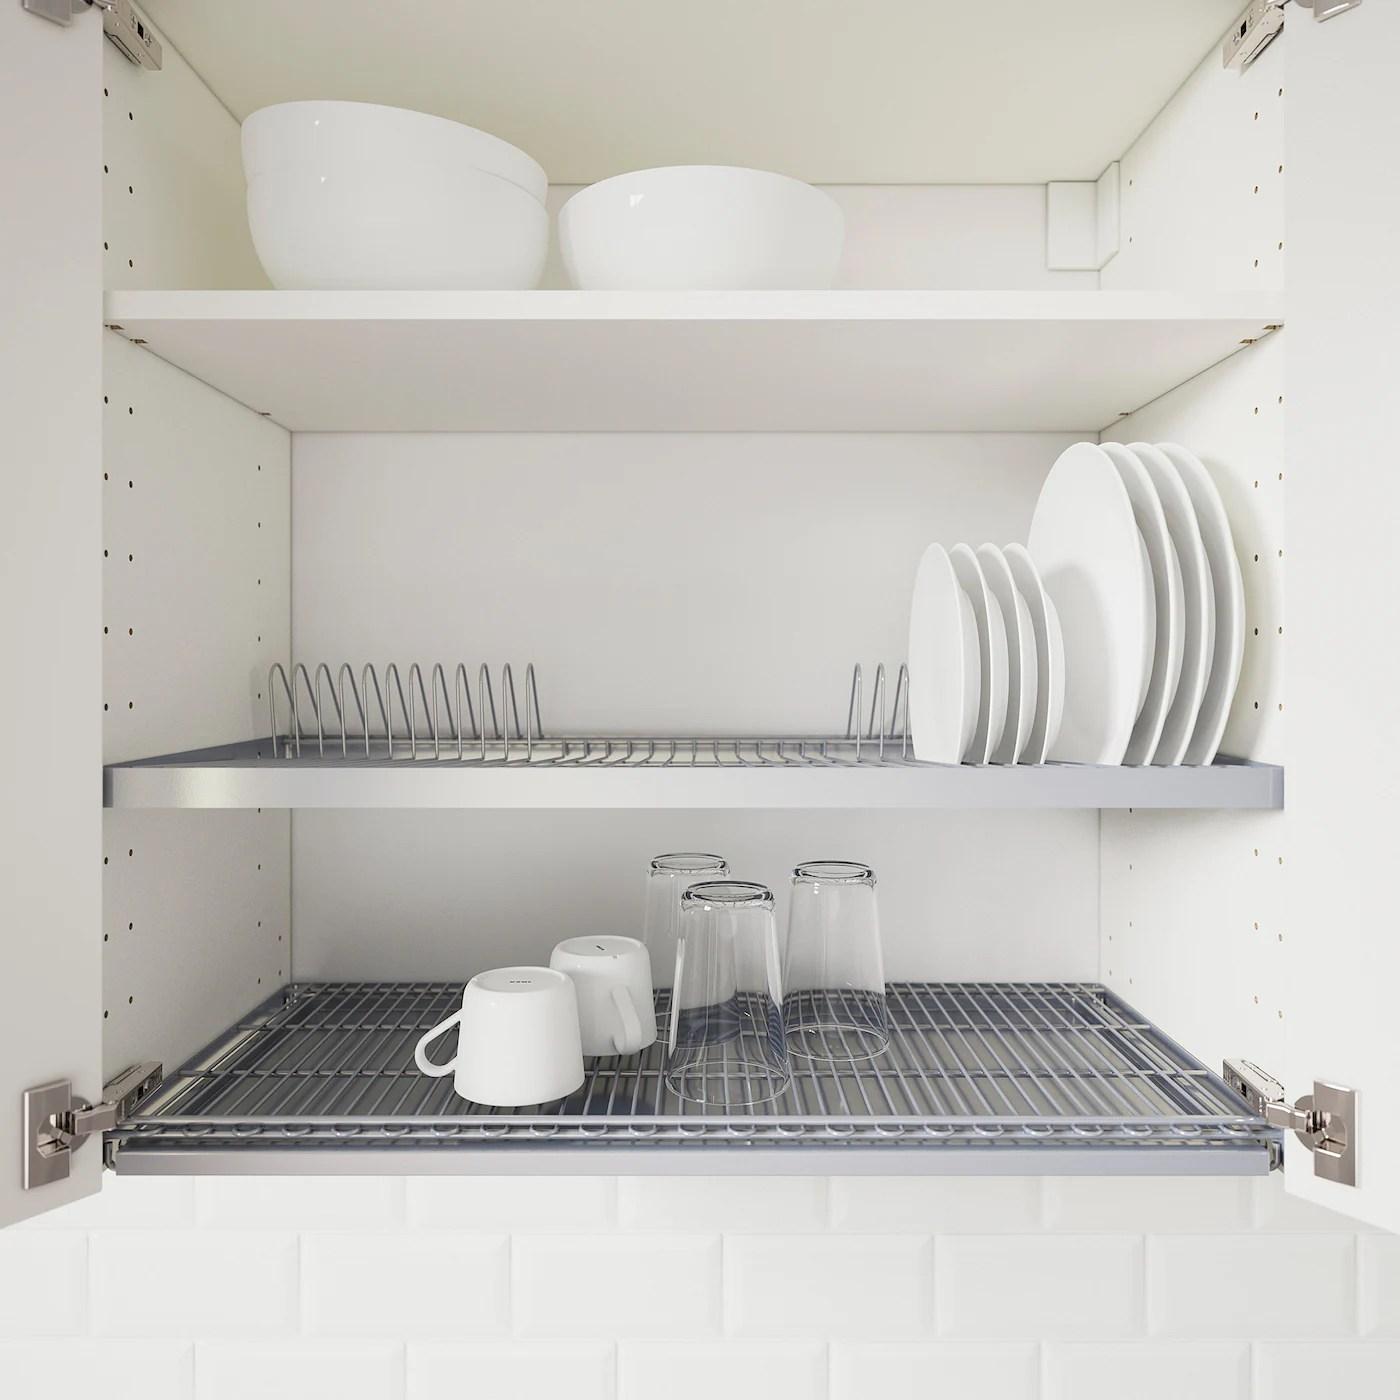 utrusta dish drainer for wall cabinet 80x35 cm